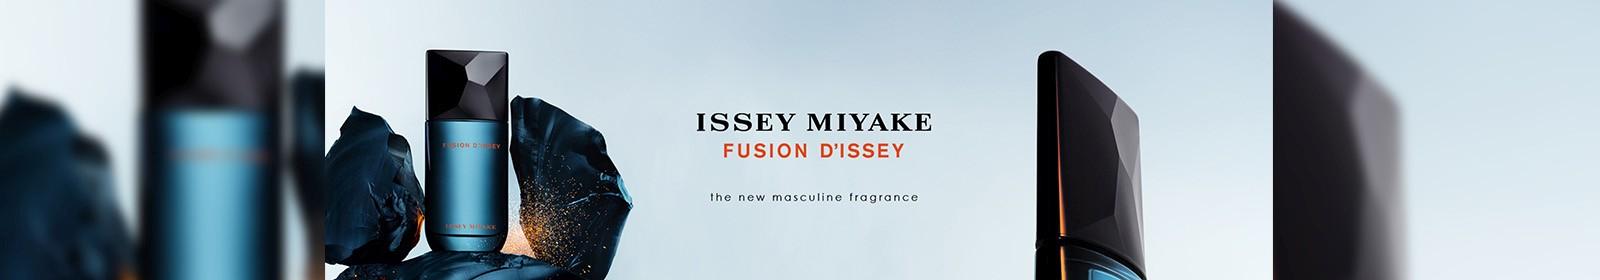 cosmetice/baie-si-corp issey_miyake